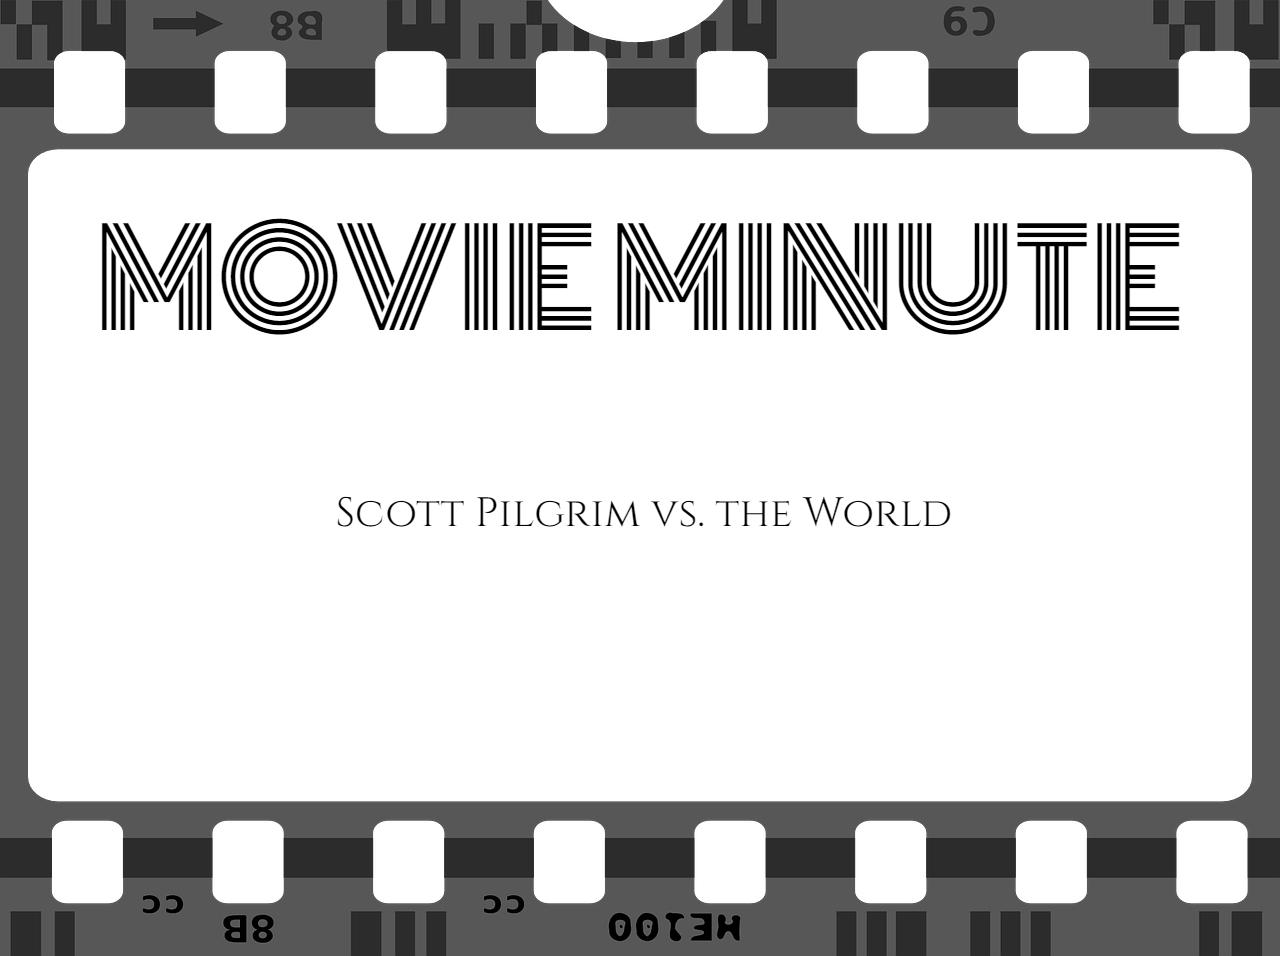 Scott Pilgrim vs. The World is a movie worth seeing.